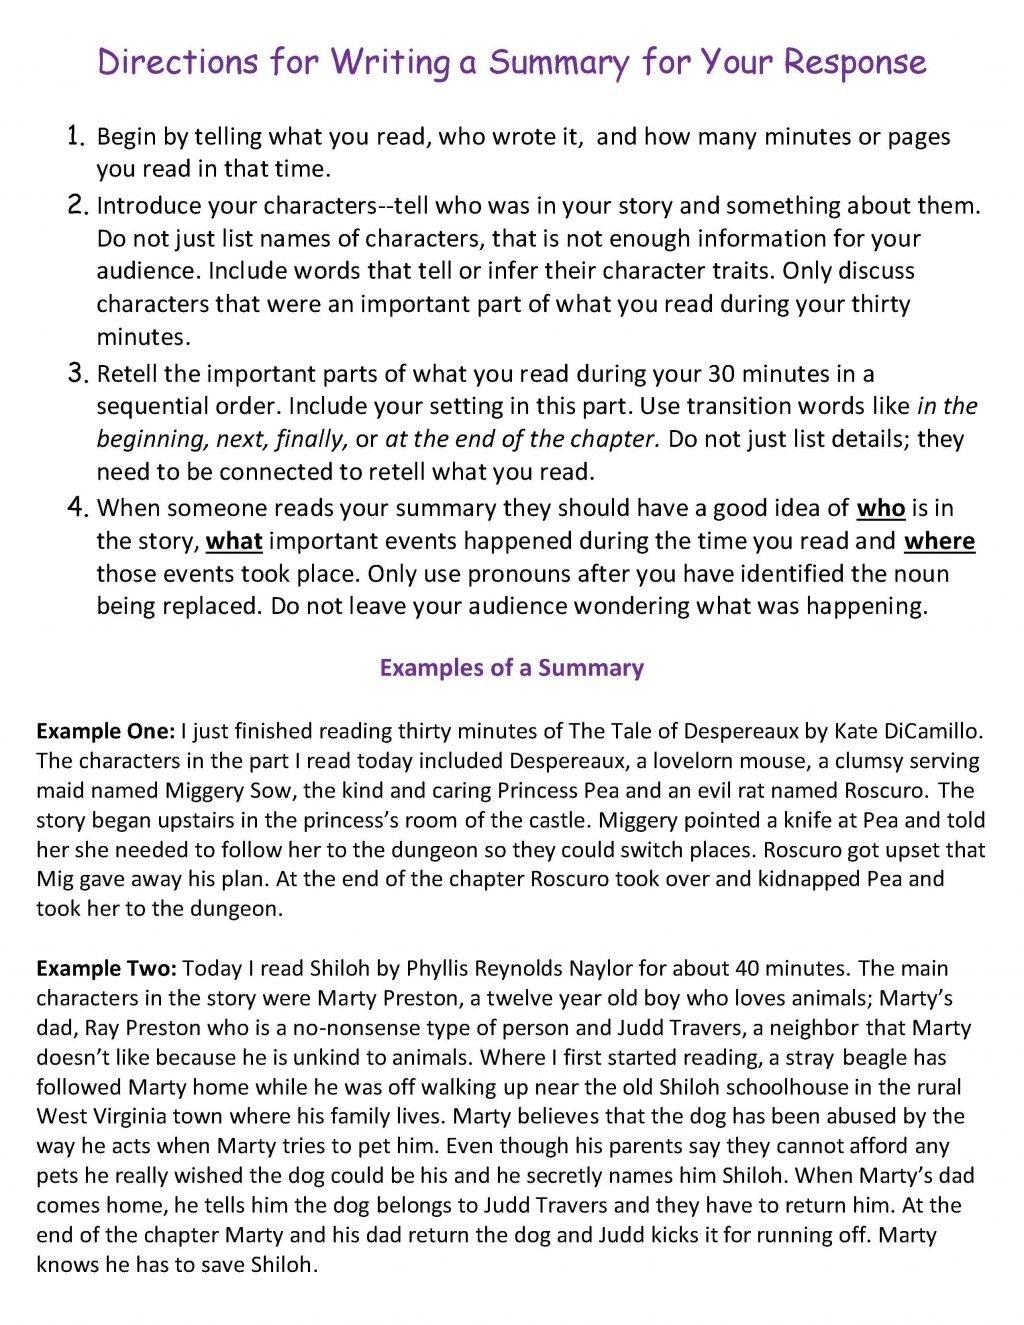 10 Lovable Main Idea Multiple Choice Worksheets ten weeks of reading response homework scholastic direc main idea